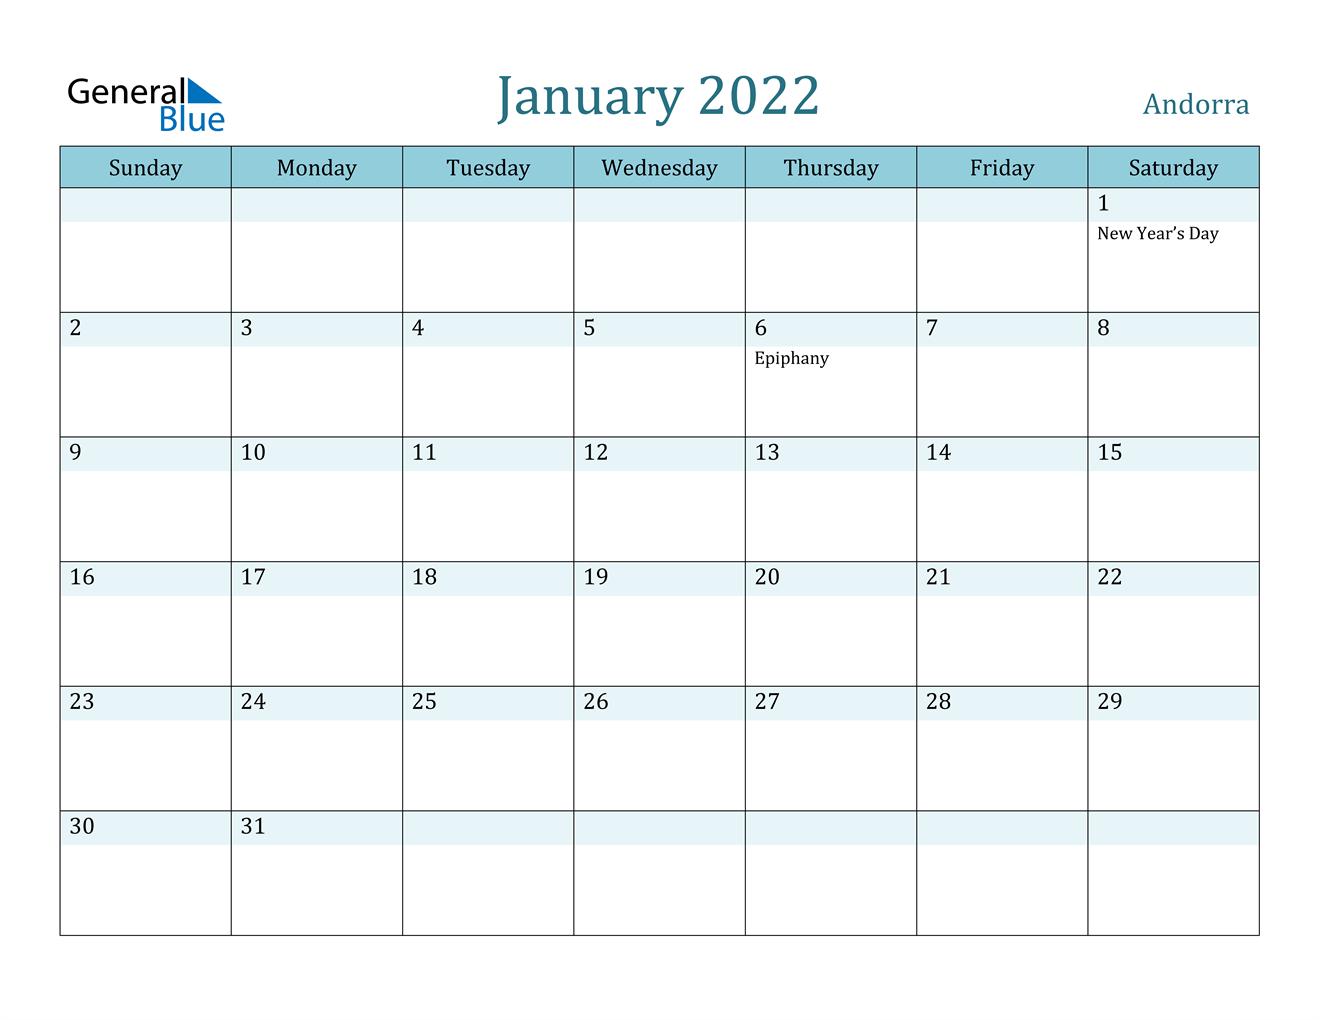 Andorra January 2022 Calendar With Holidays Intended For 2022 January Calendar With Holidays